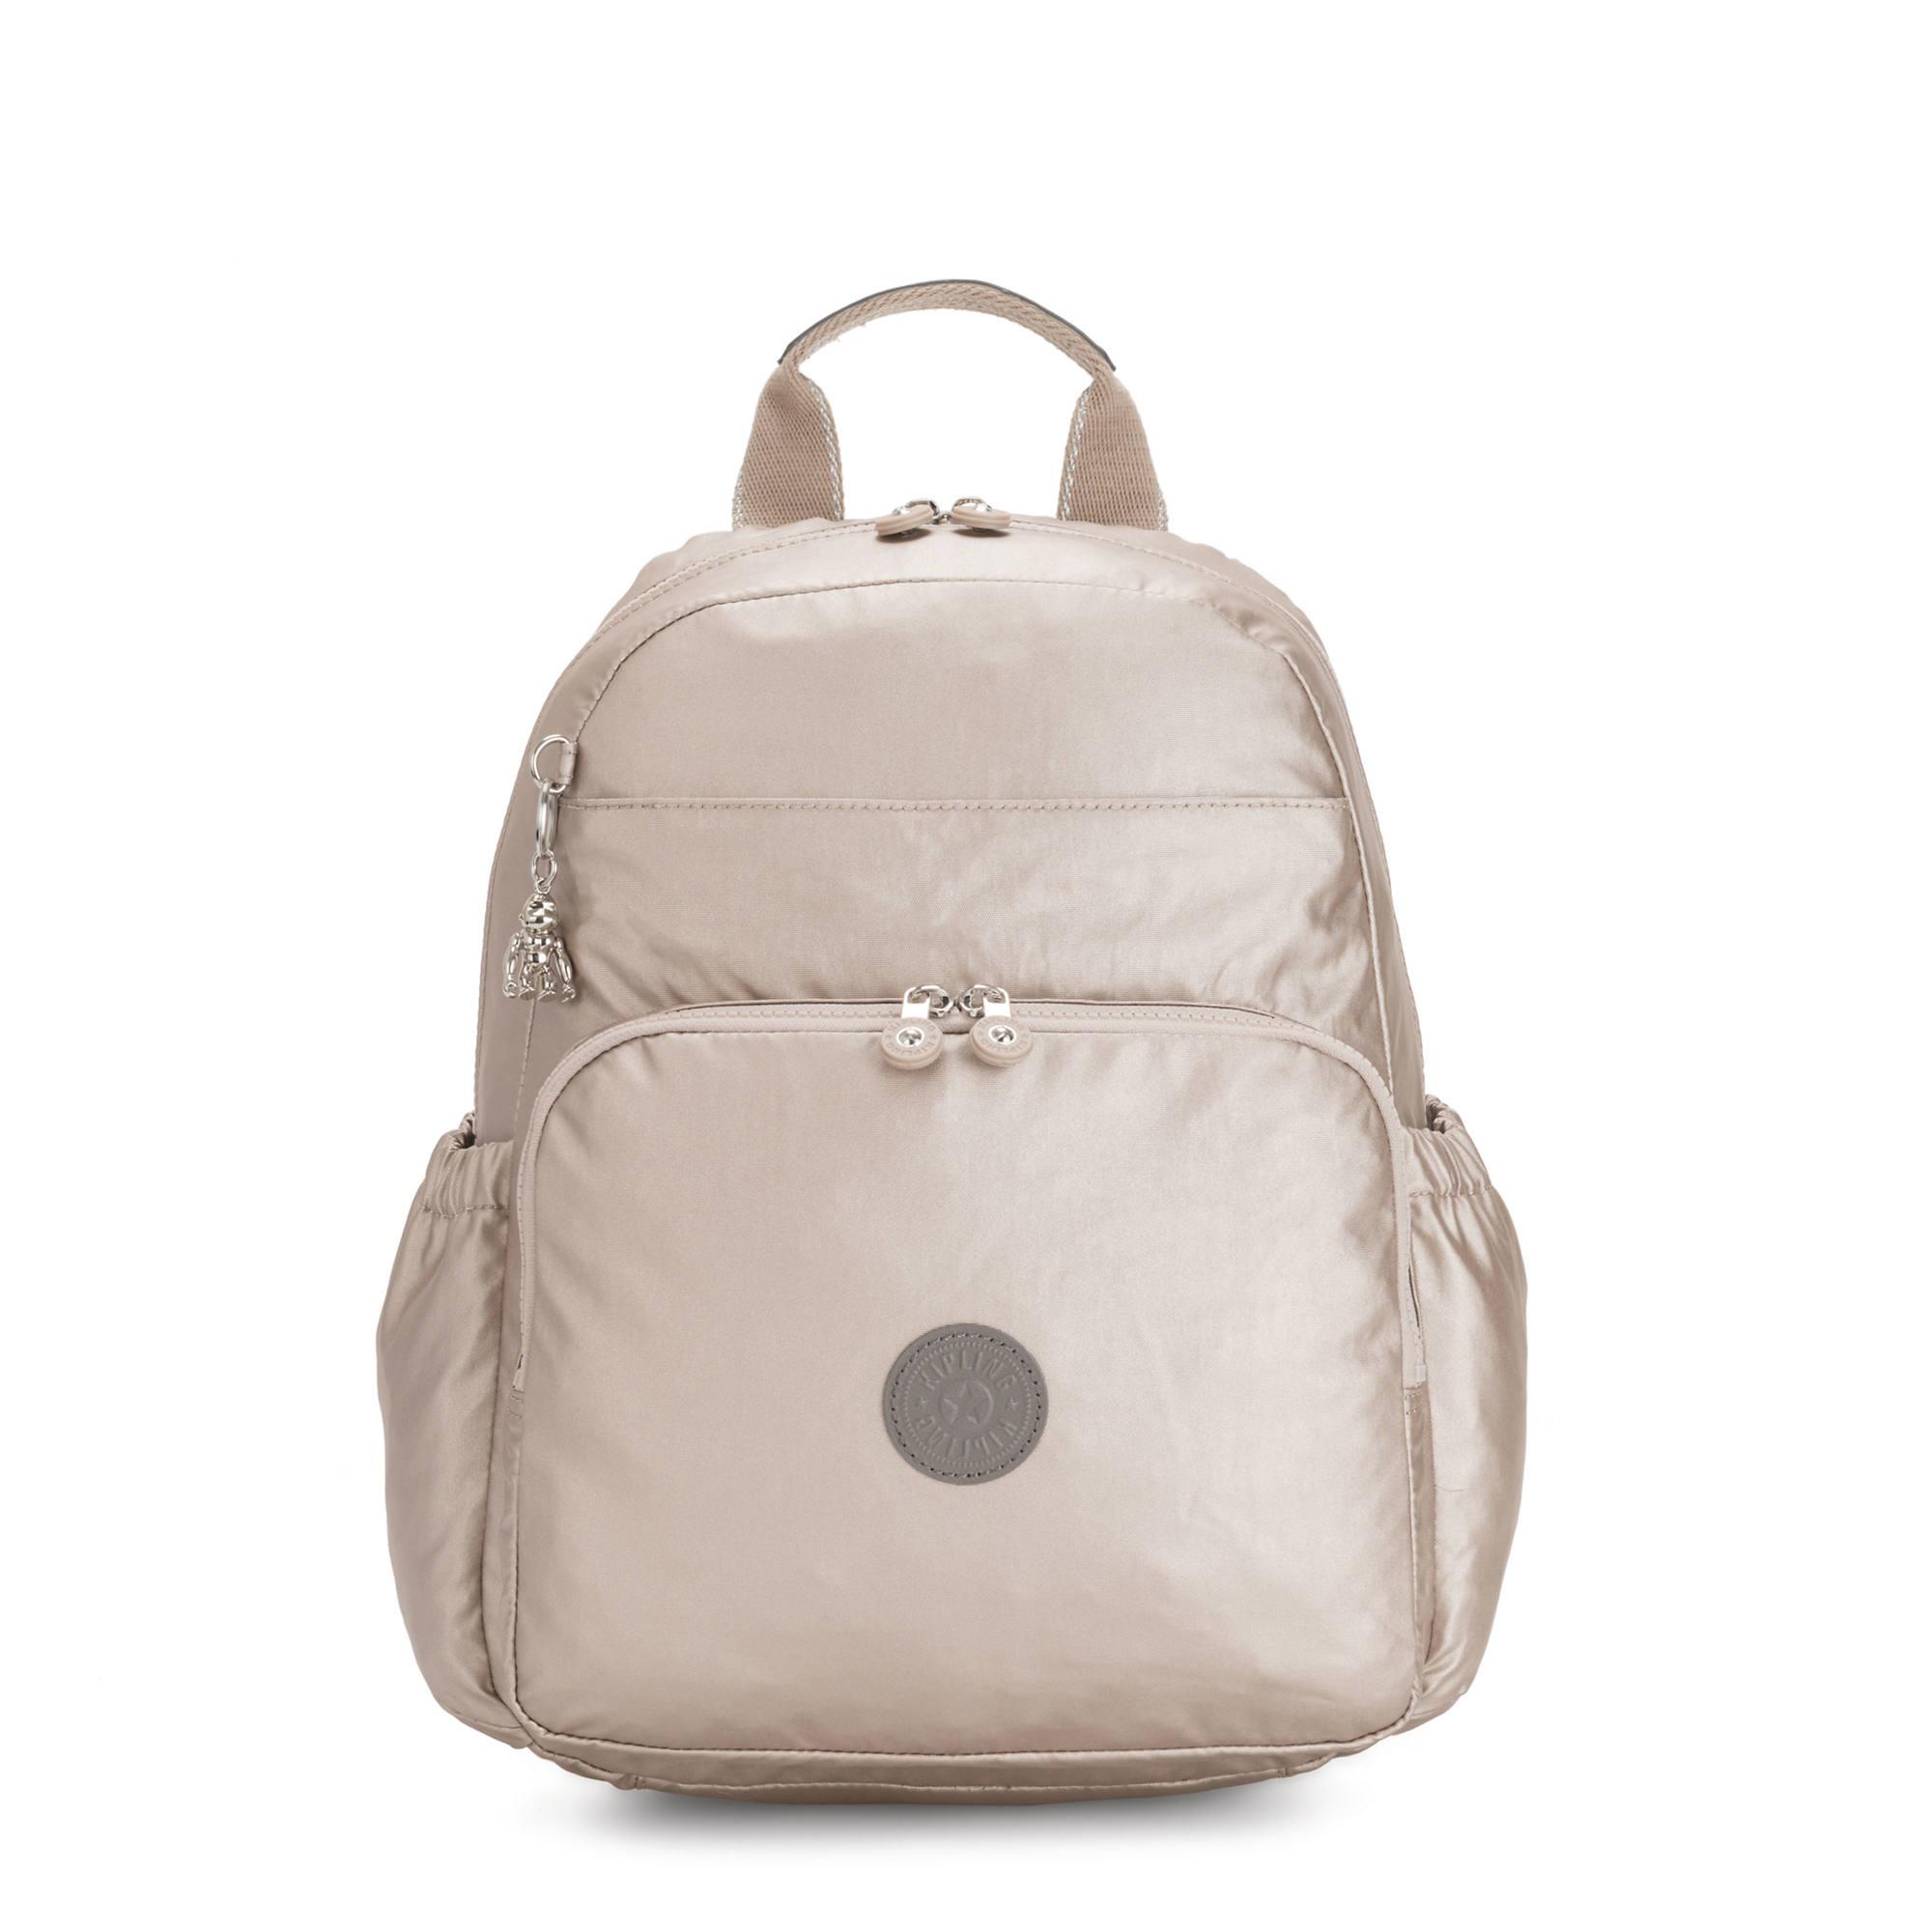 Maisie Metallic Diaper Backpack